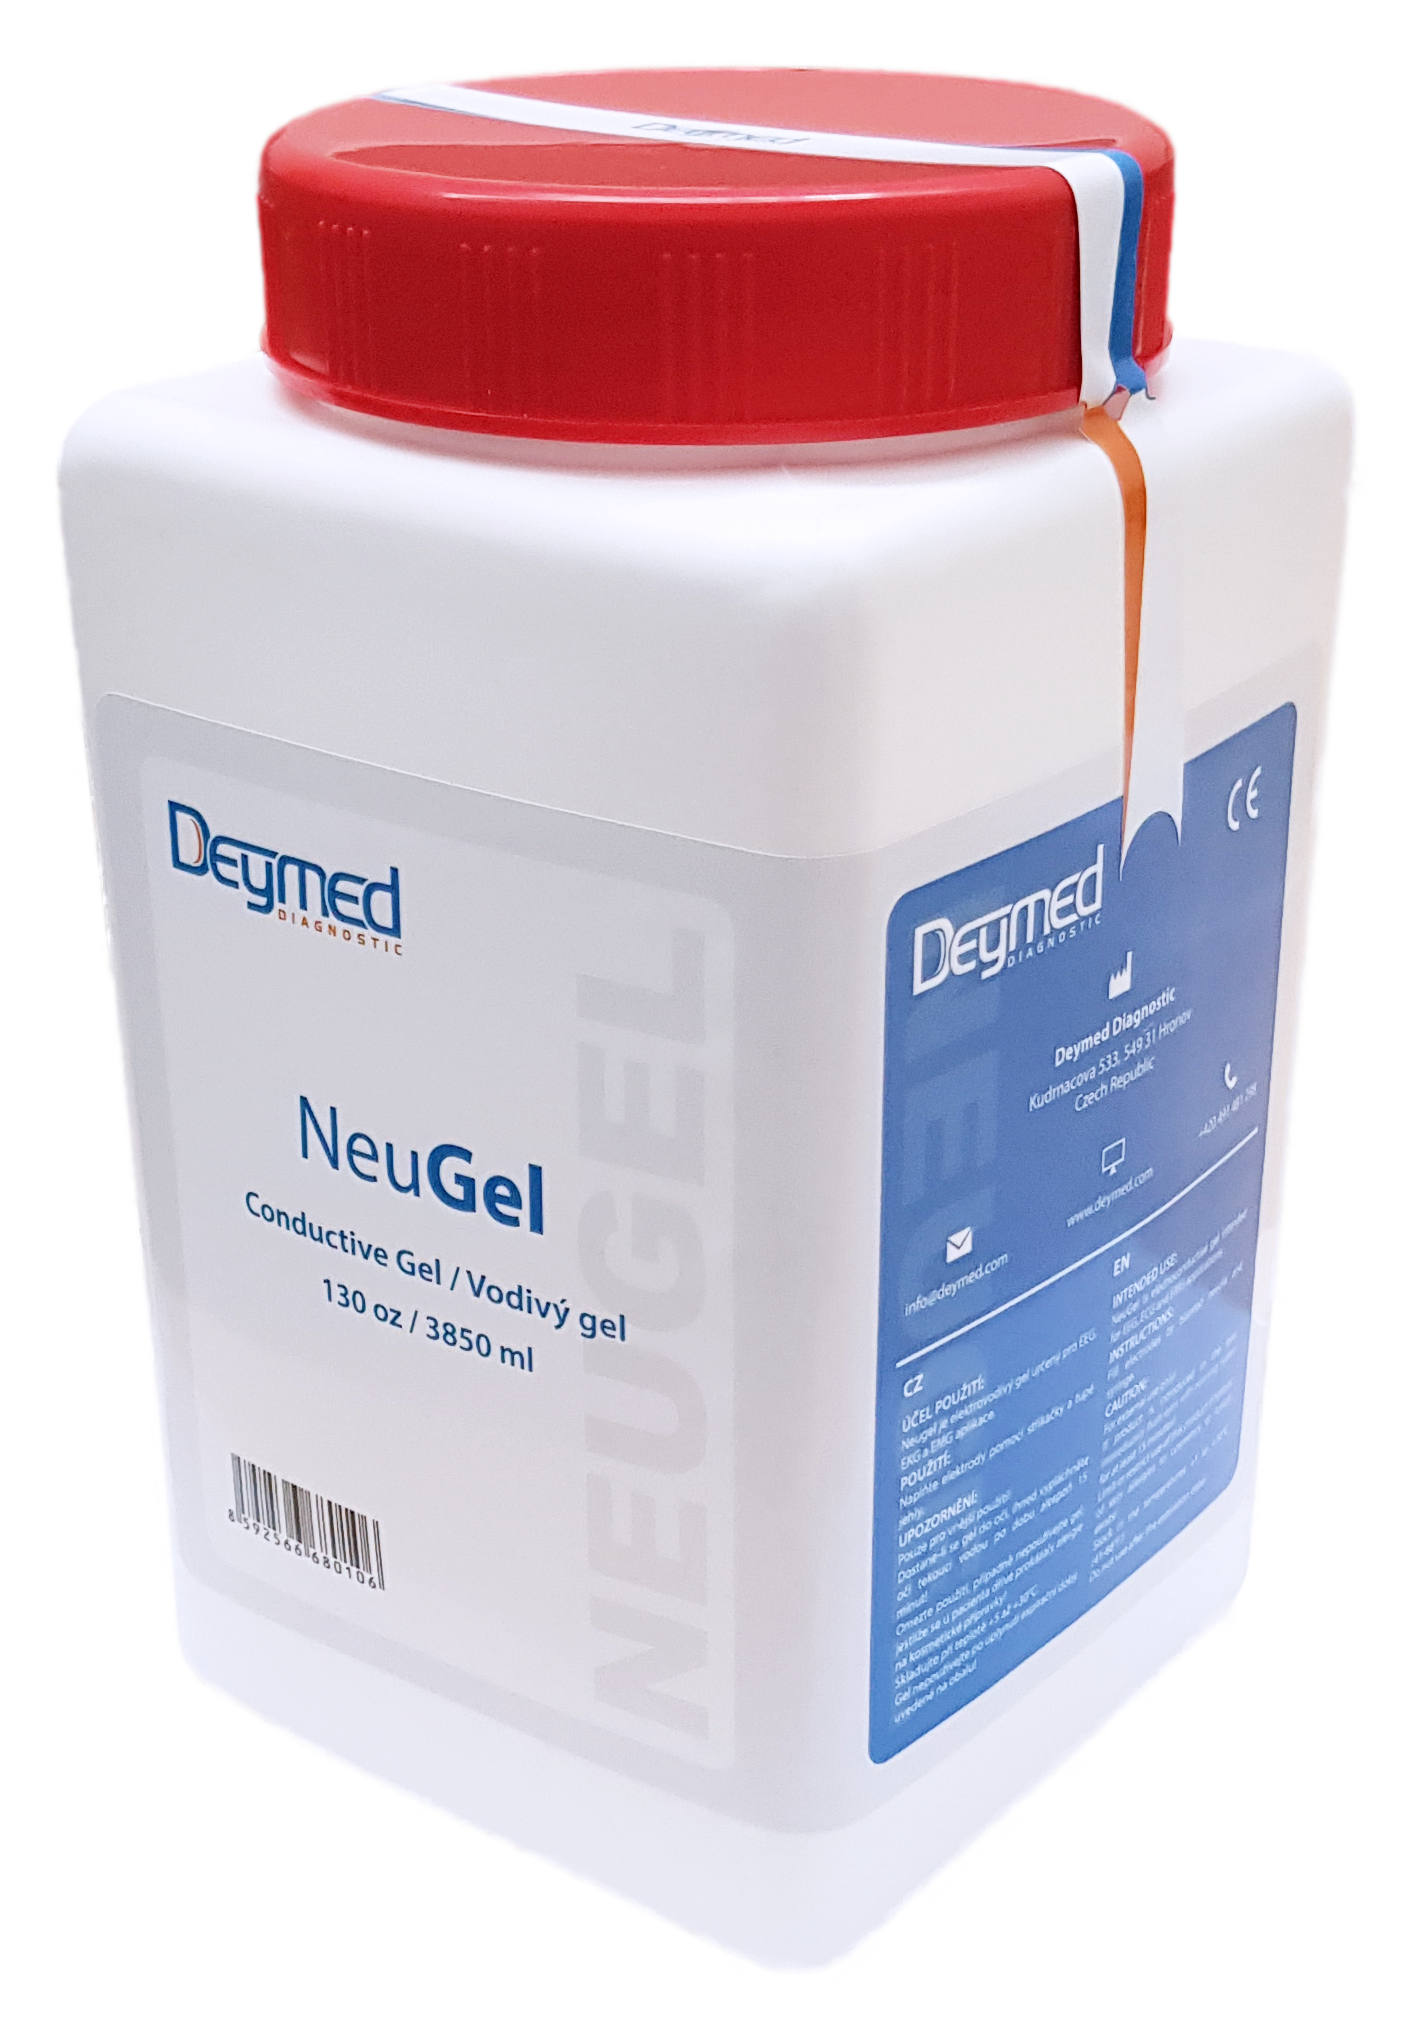 NeuGEL - EEG elektrovodivý gel Deymed: 3850ml (130 oz)